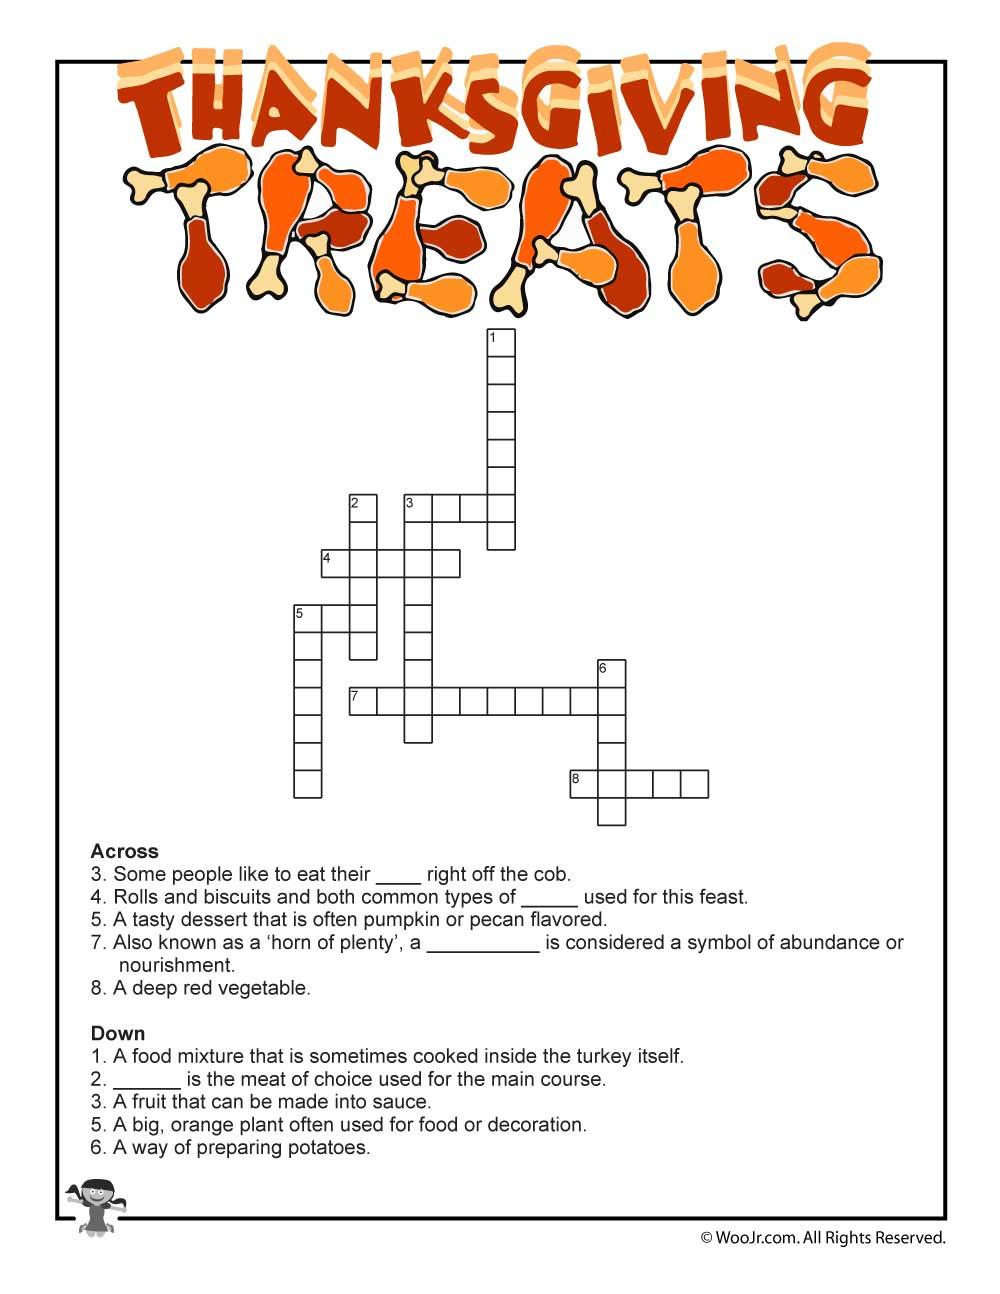 Thanksgiving Crossword Puzzle | Woo! Jr. Kids Activities - Printable Crossword Puzzles For Thanksgiving